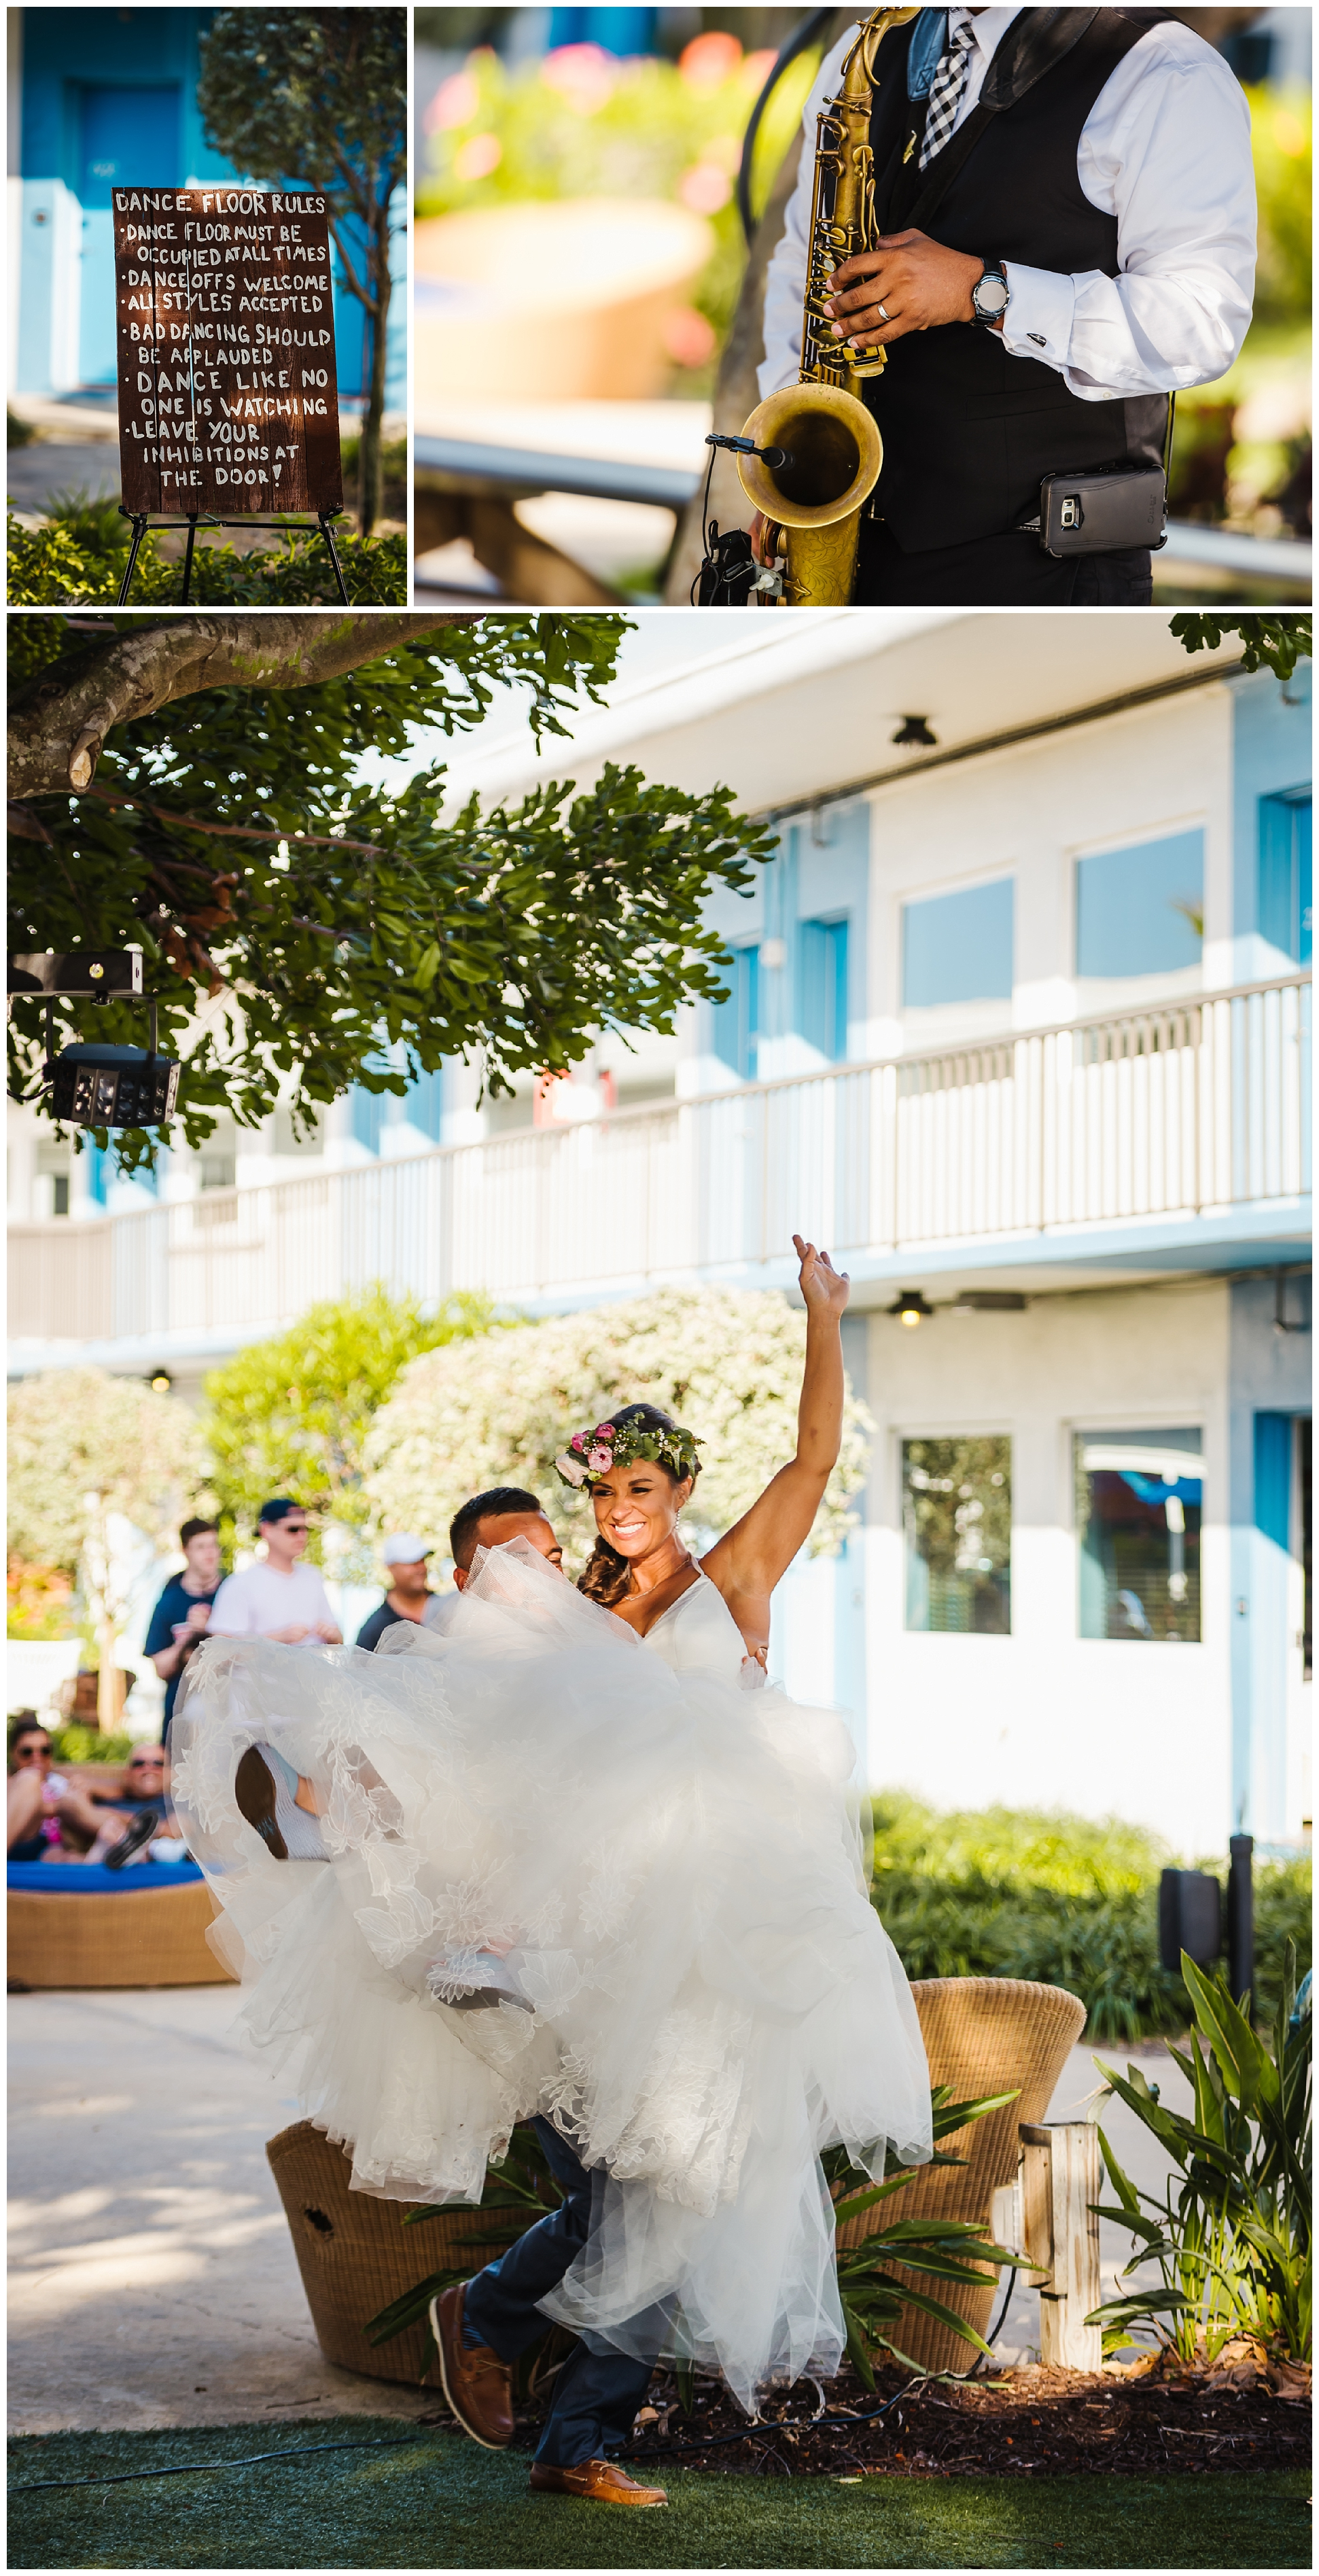 Tampa-wedding-photographer-vera-wang-flower-crown-post-card-inn_0029.jpg